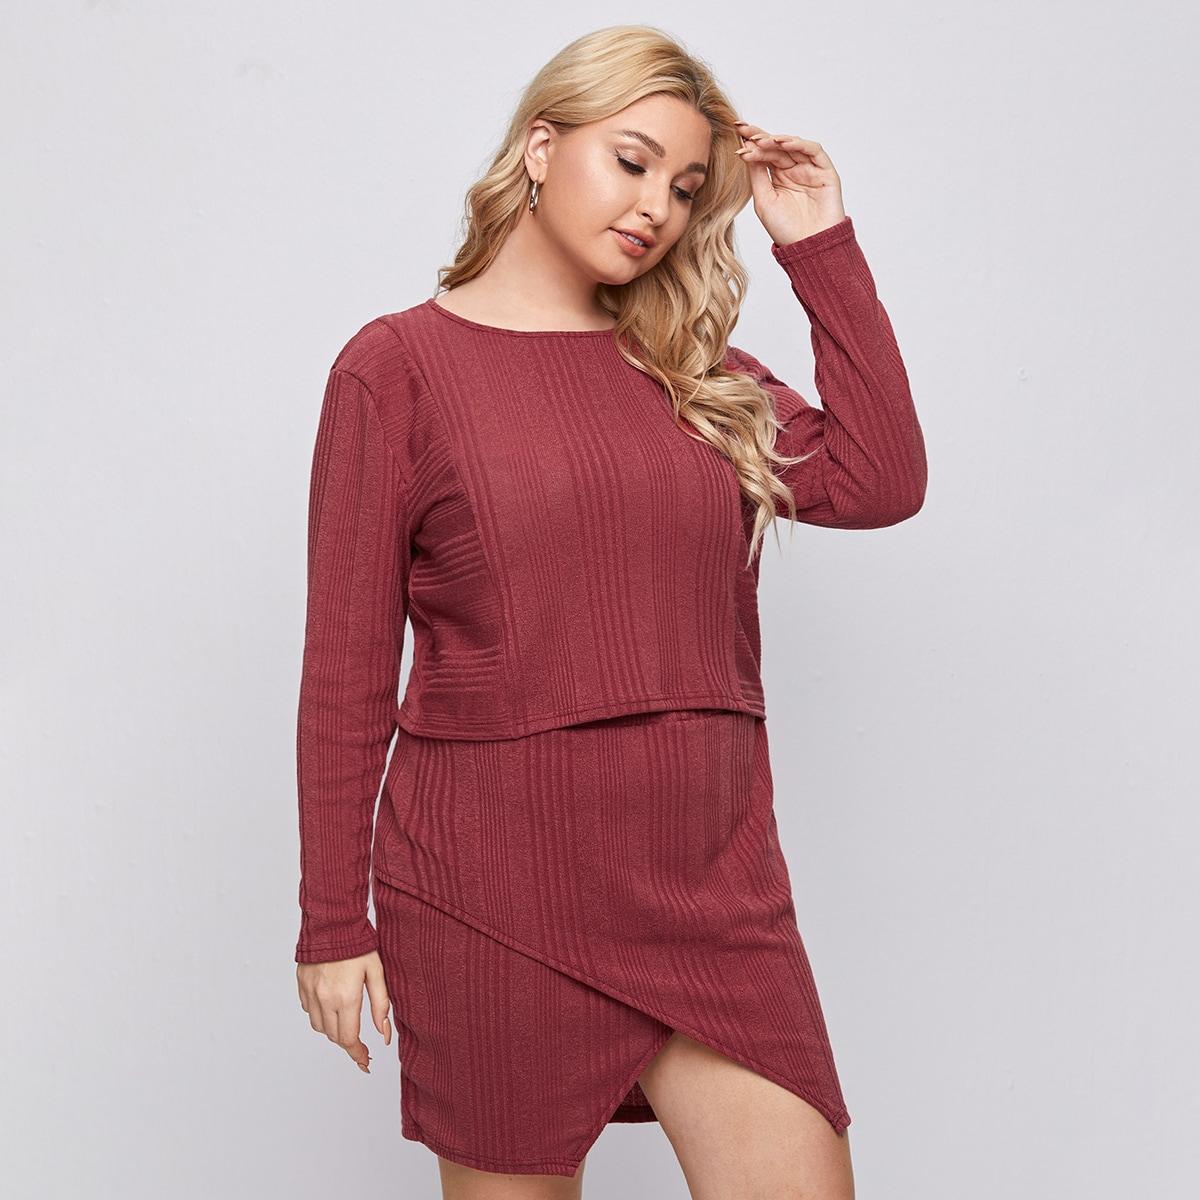 Вязаная кроп футболка и асимметричная юбка в рубчик размера плюс